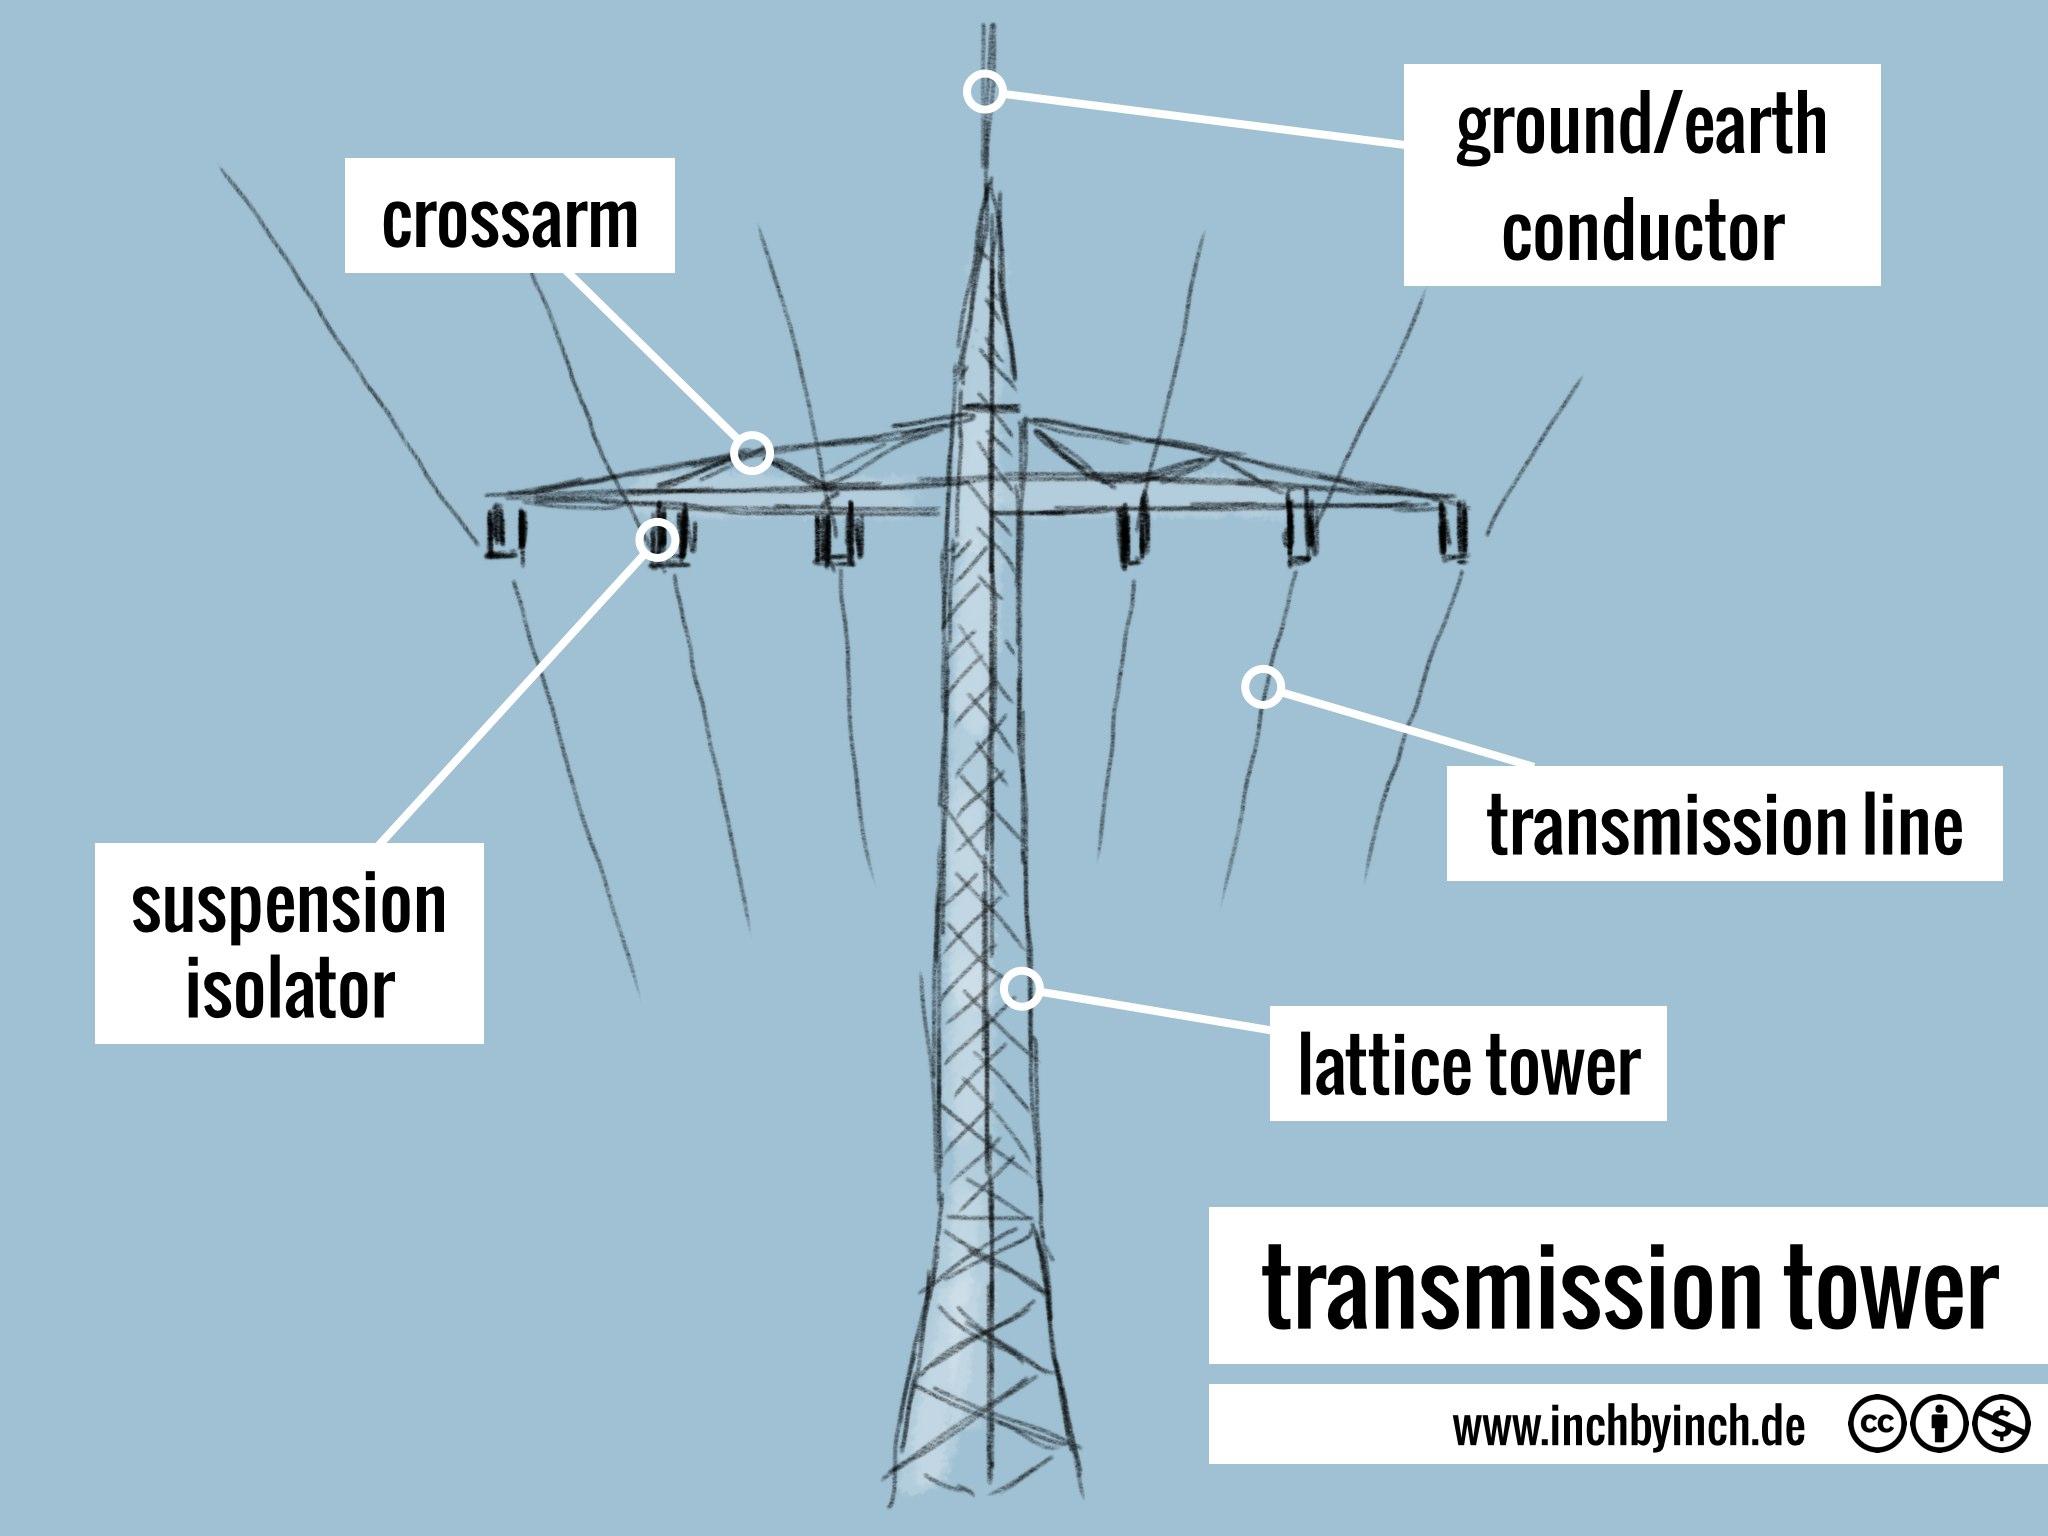 transmission tower/pylon Hochspannungsmast: inchbyinch.de/pictorial/transmission-tower